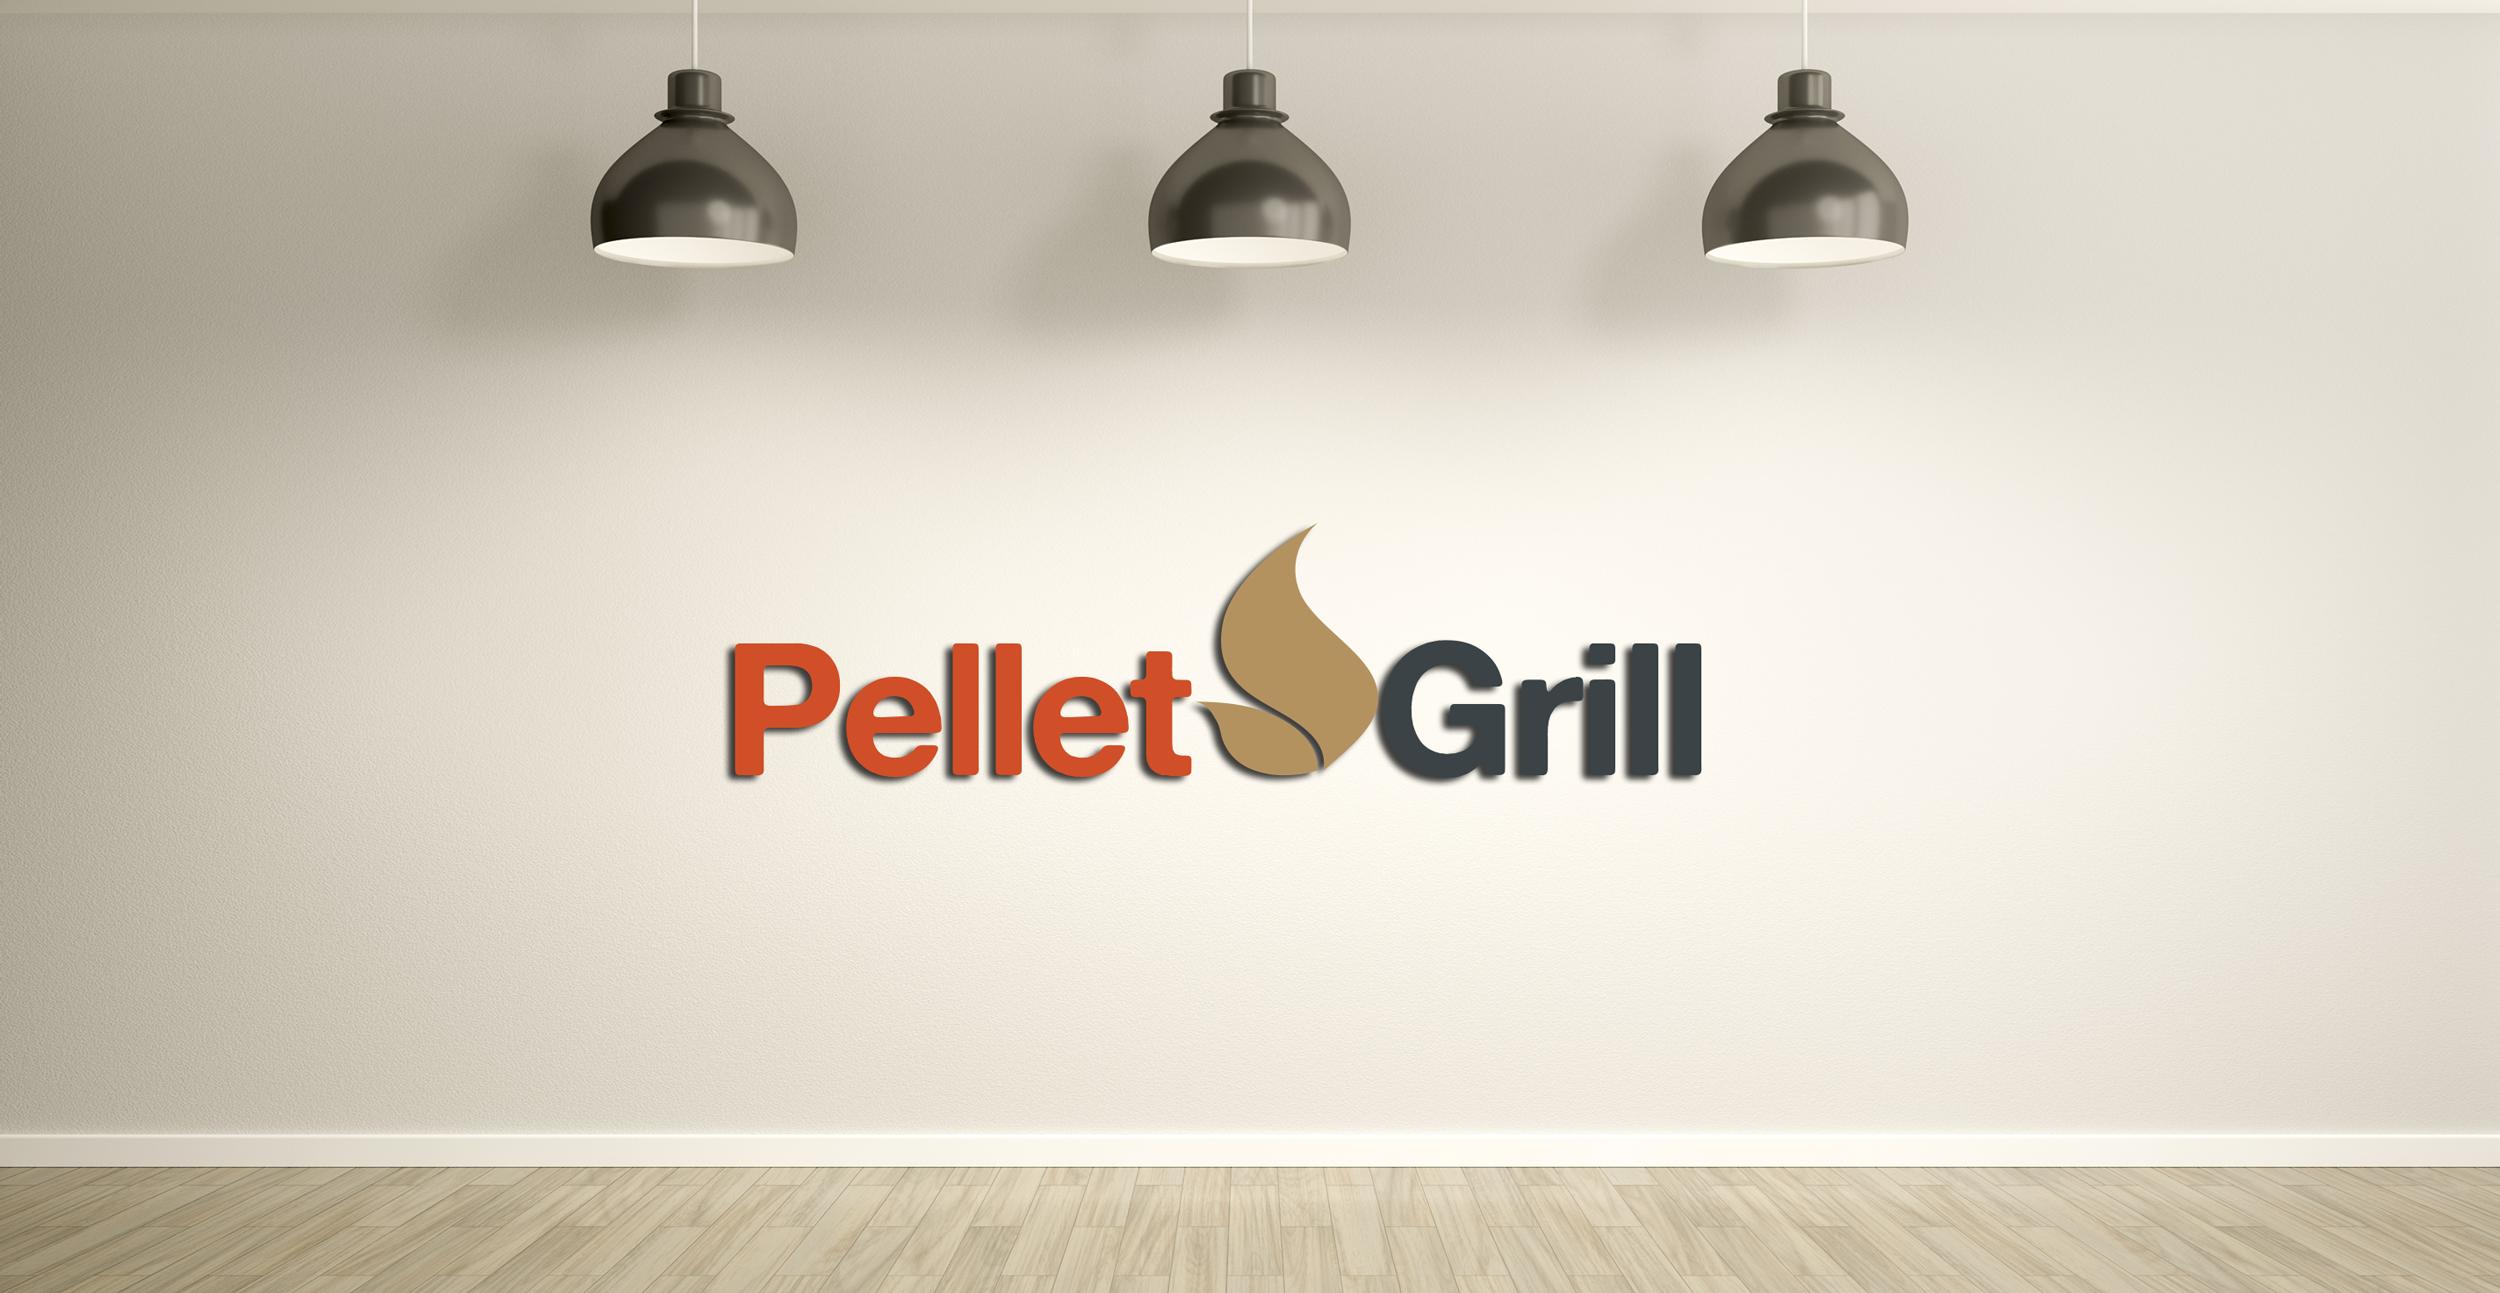 pellet grill logo pellet grill Pellet Grill | Vídeo | Design Gráfico pellet grill logo